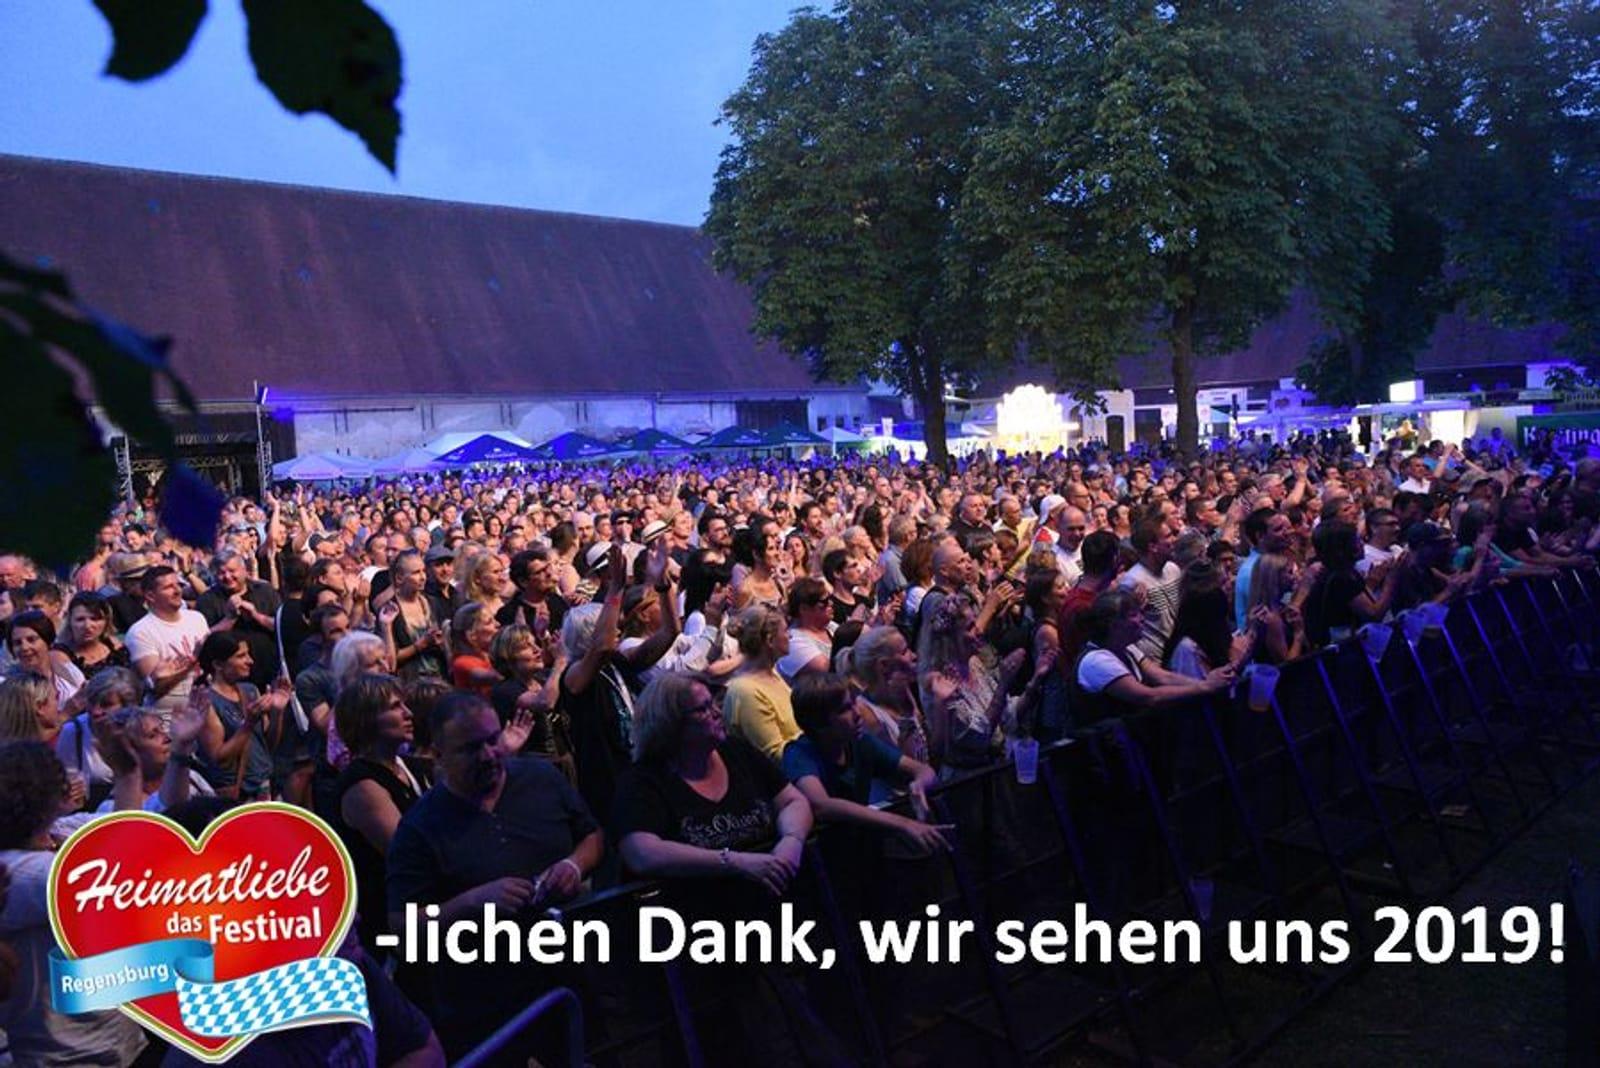 Heimatliebe - das Festival 2019